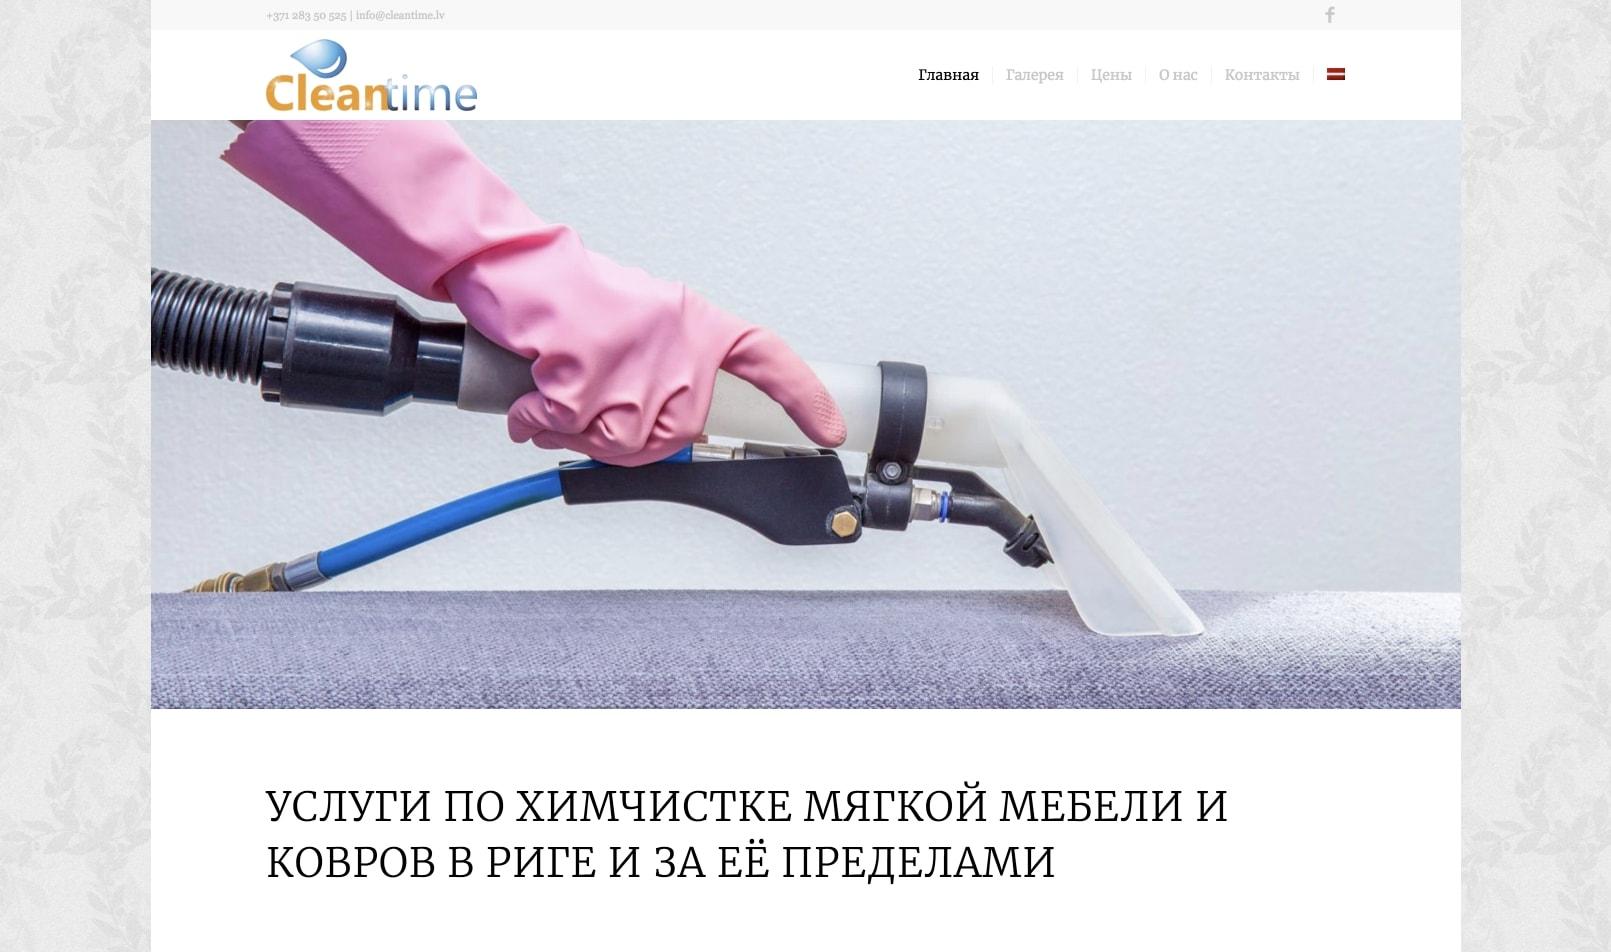 Сайт визитка для сервиса по чистке мебели